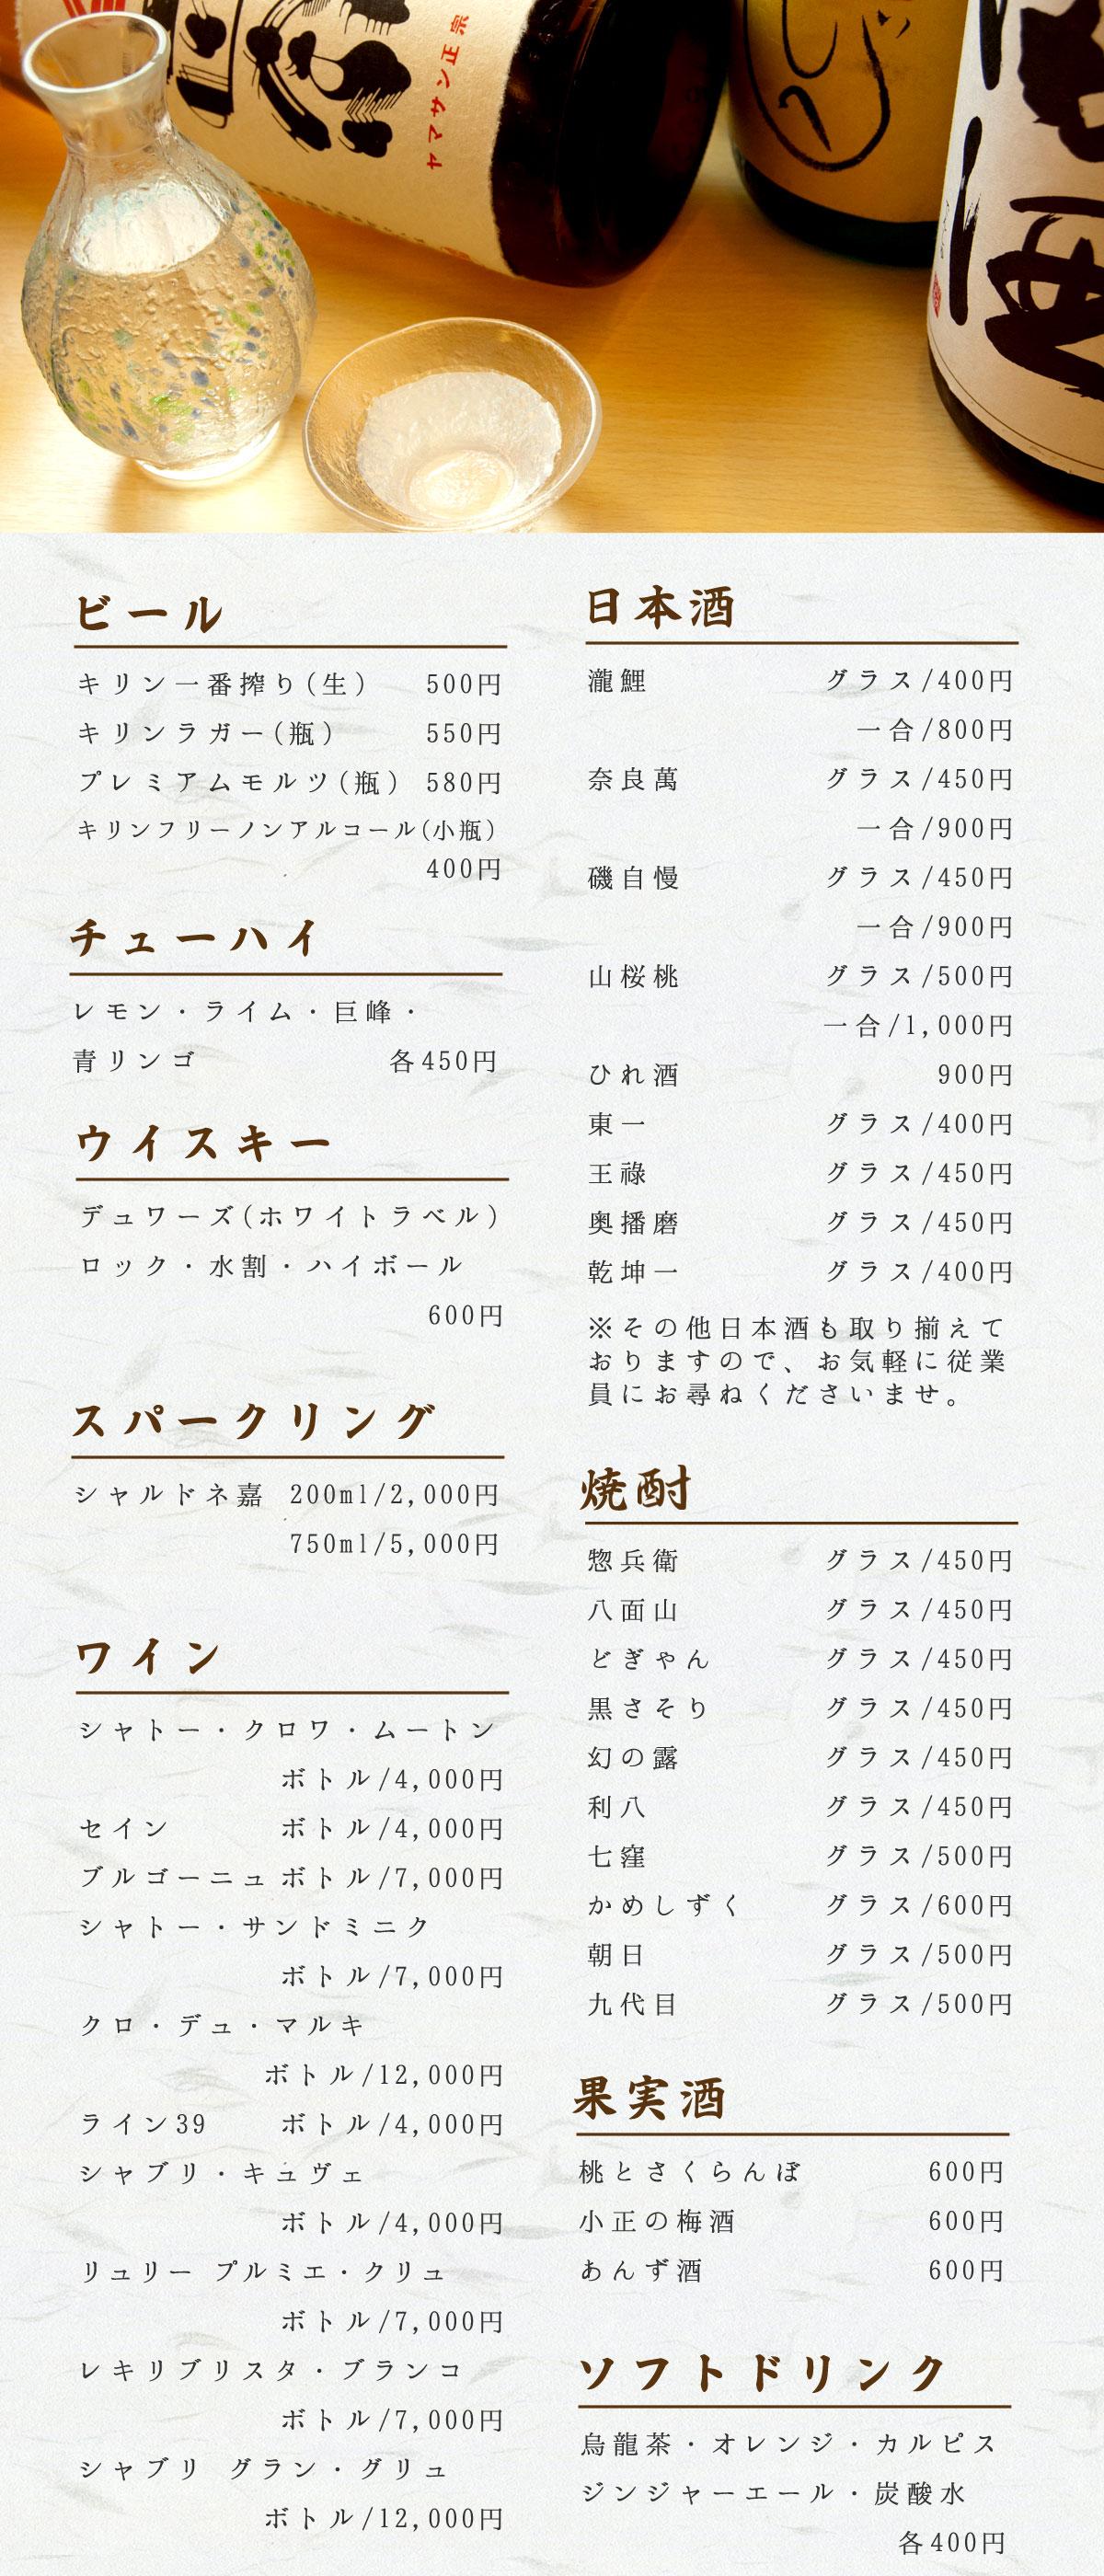 JR・阪急・阪神・各線三宮駅より改札を出て徒歩3分 四季魚菜うらべ